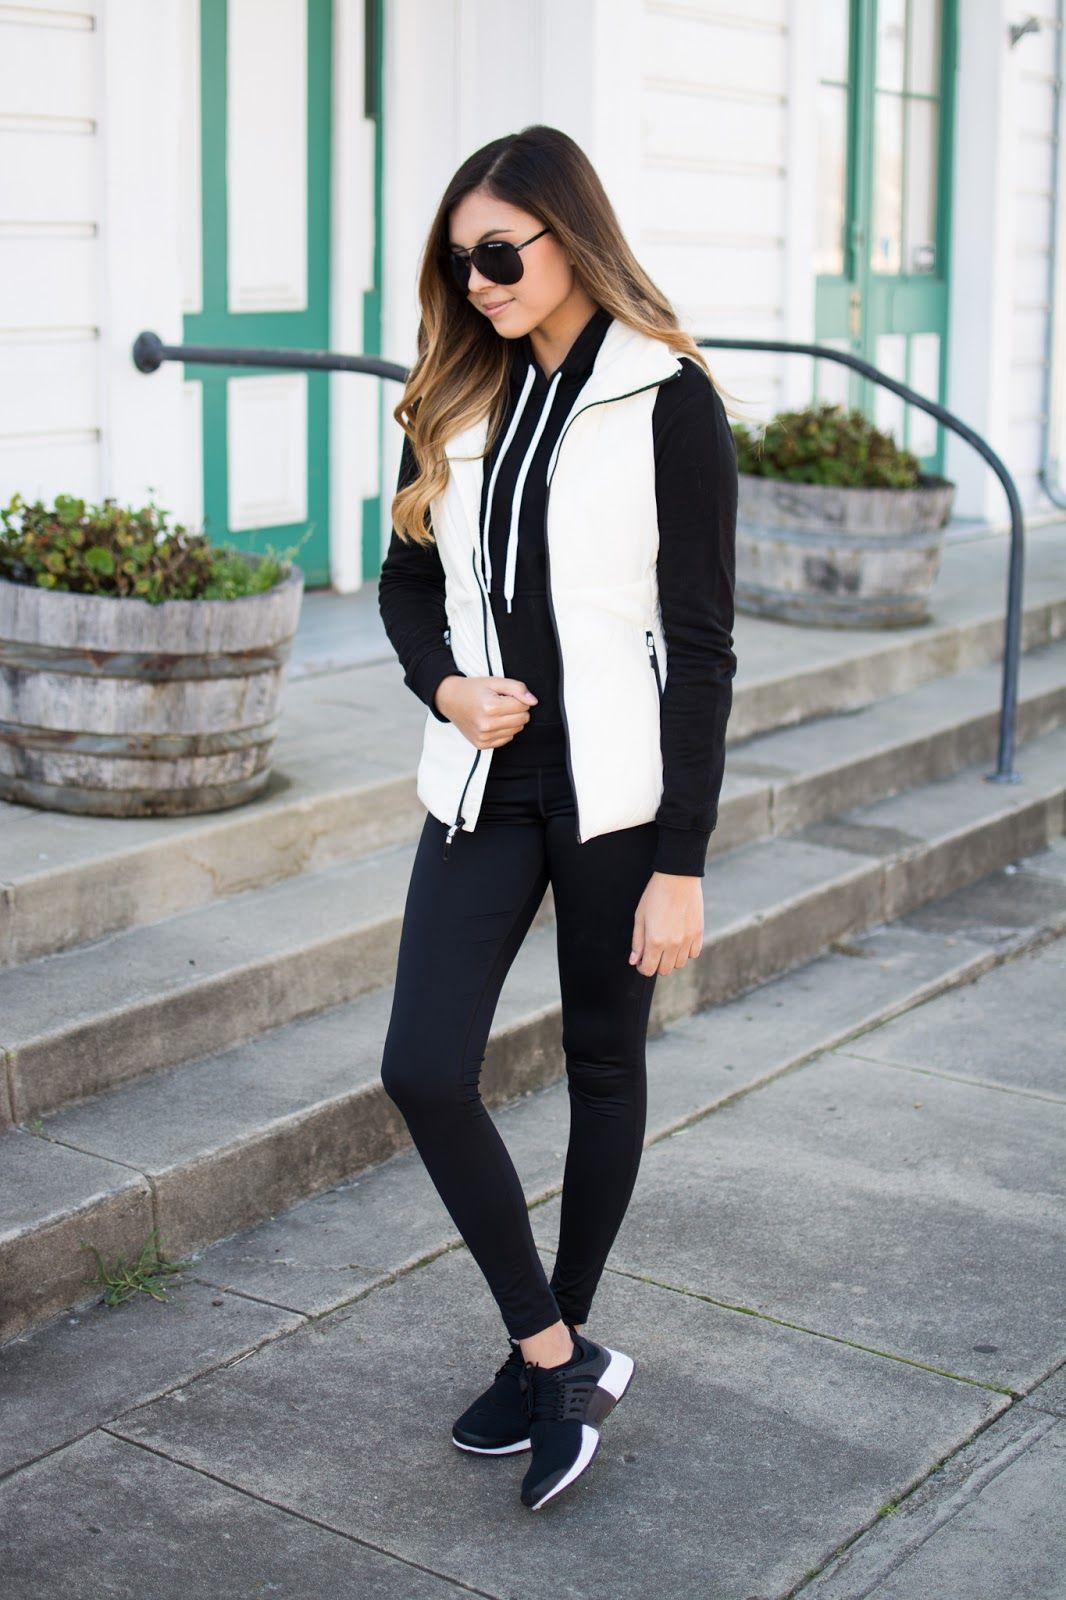 How to white wear leggings in winter